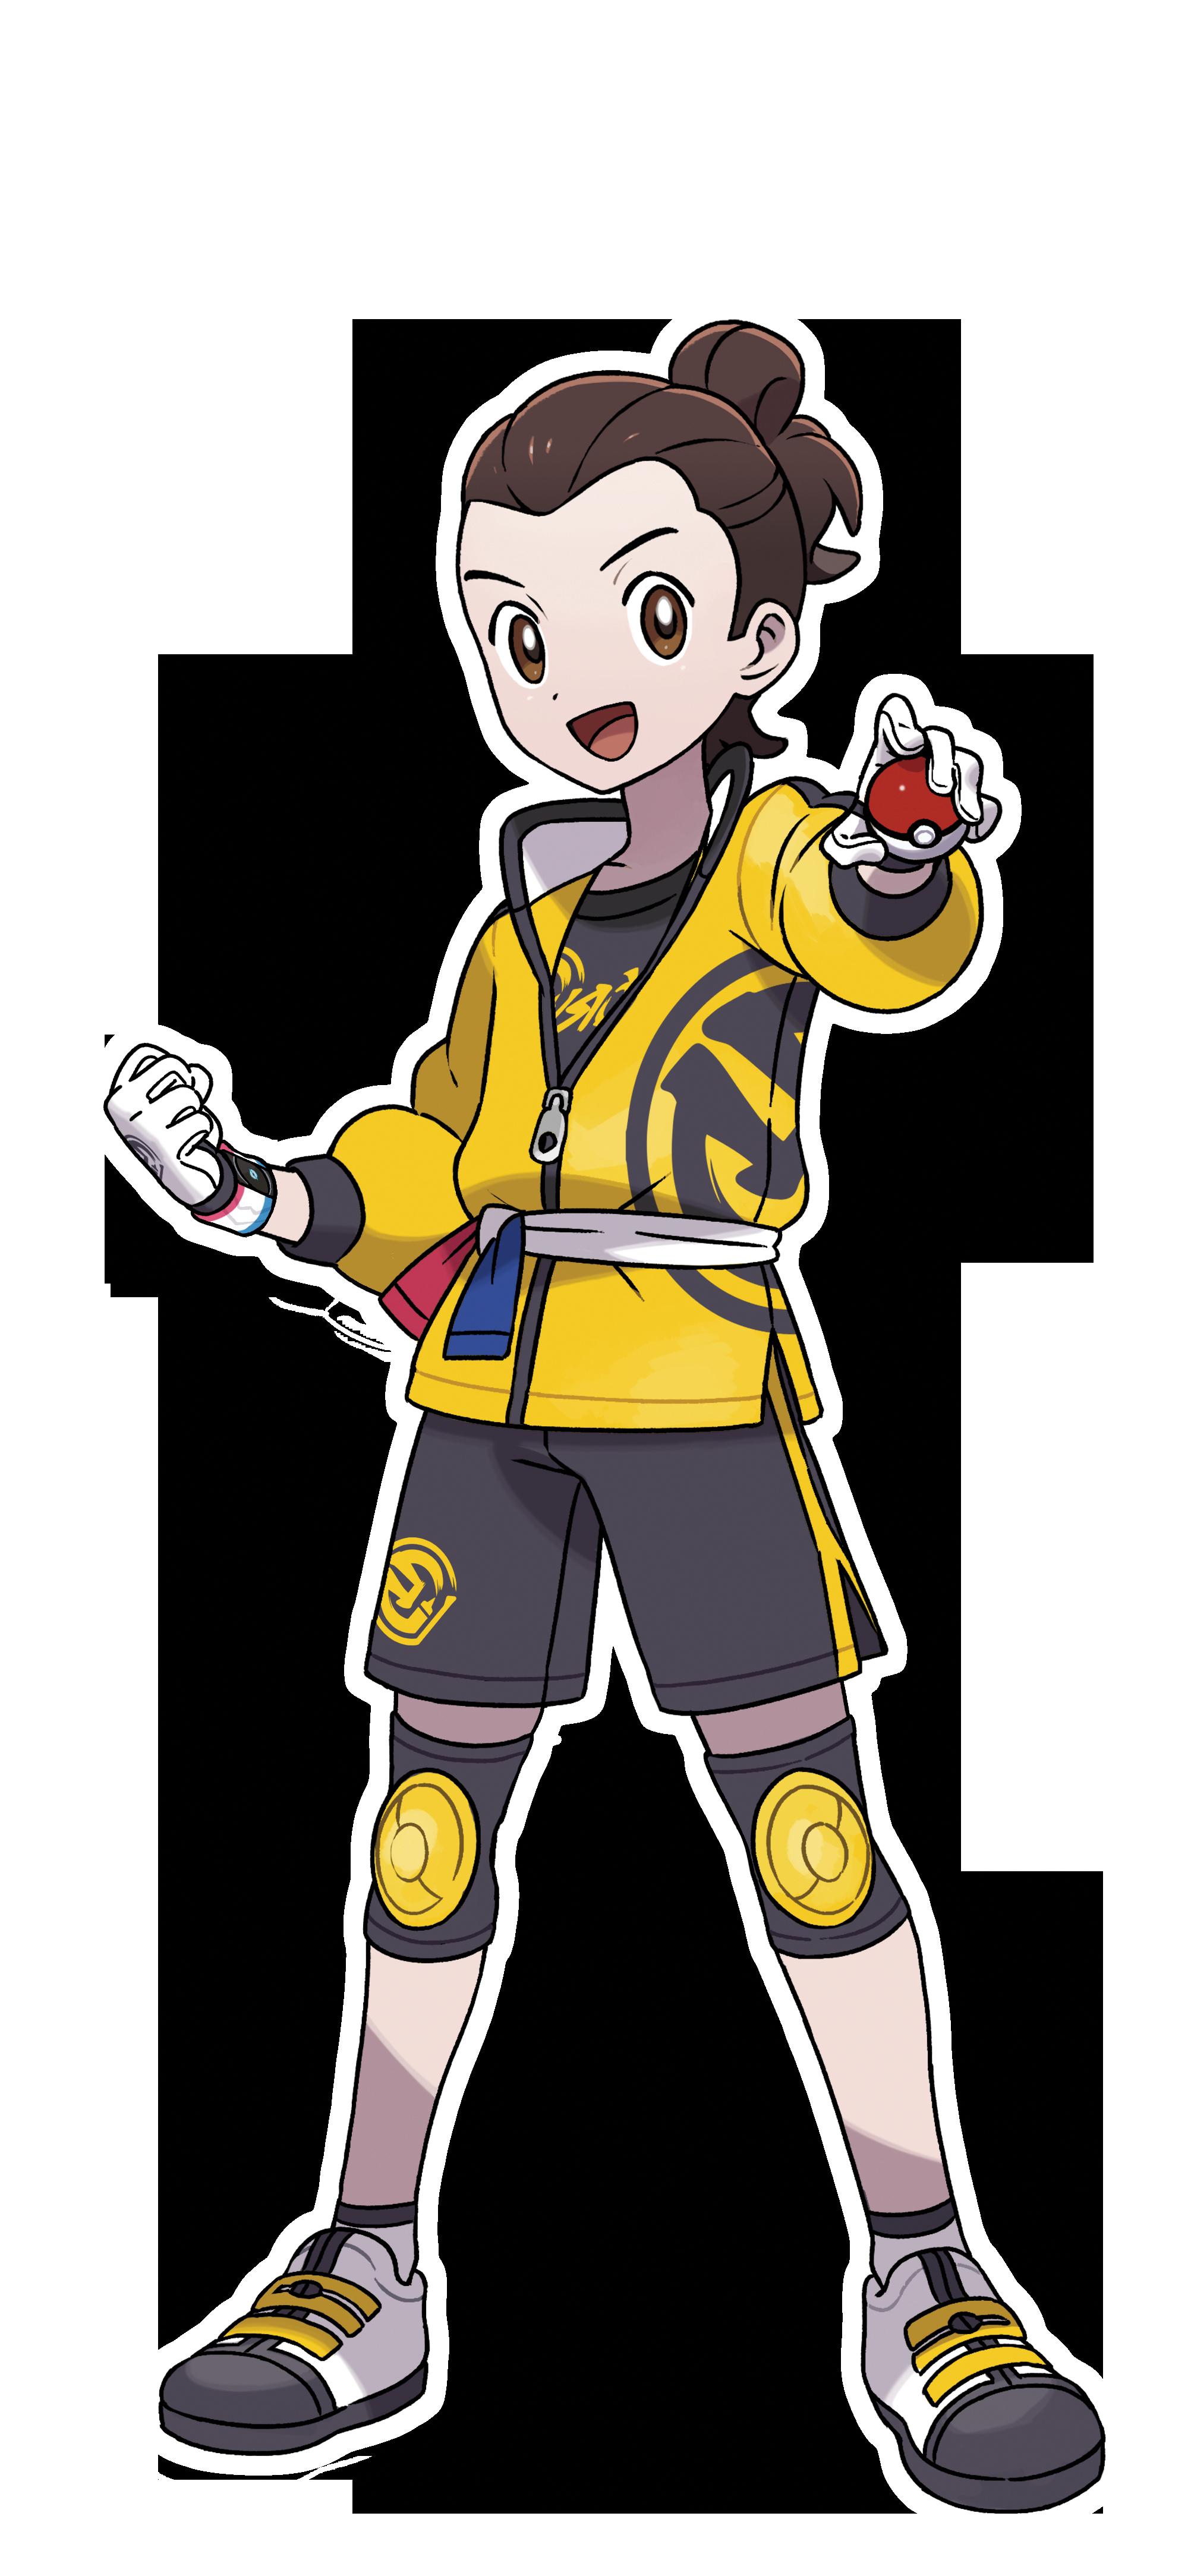 Pokemon-Sword-and-Shield_2020_01-09-20_025